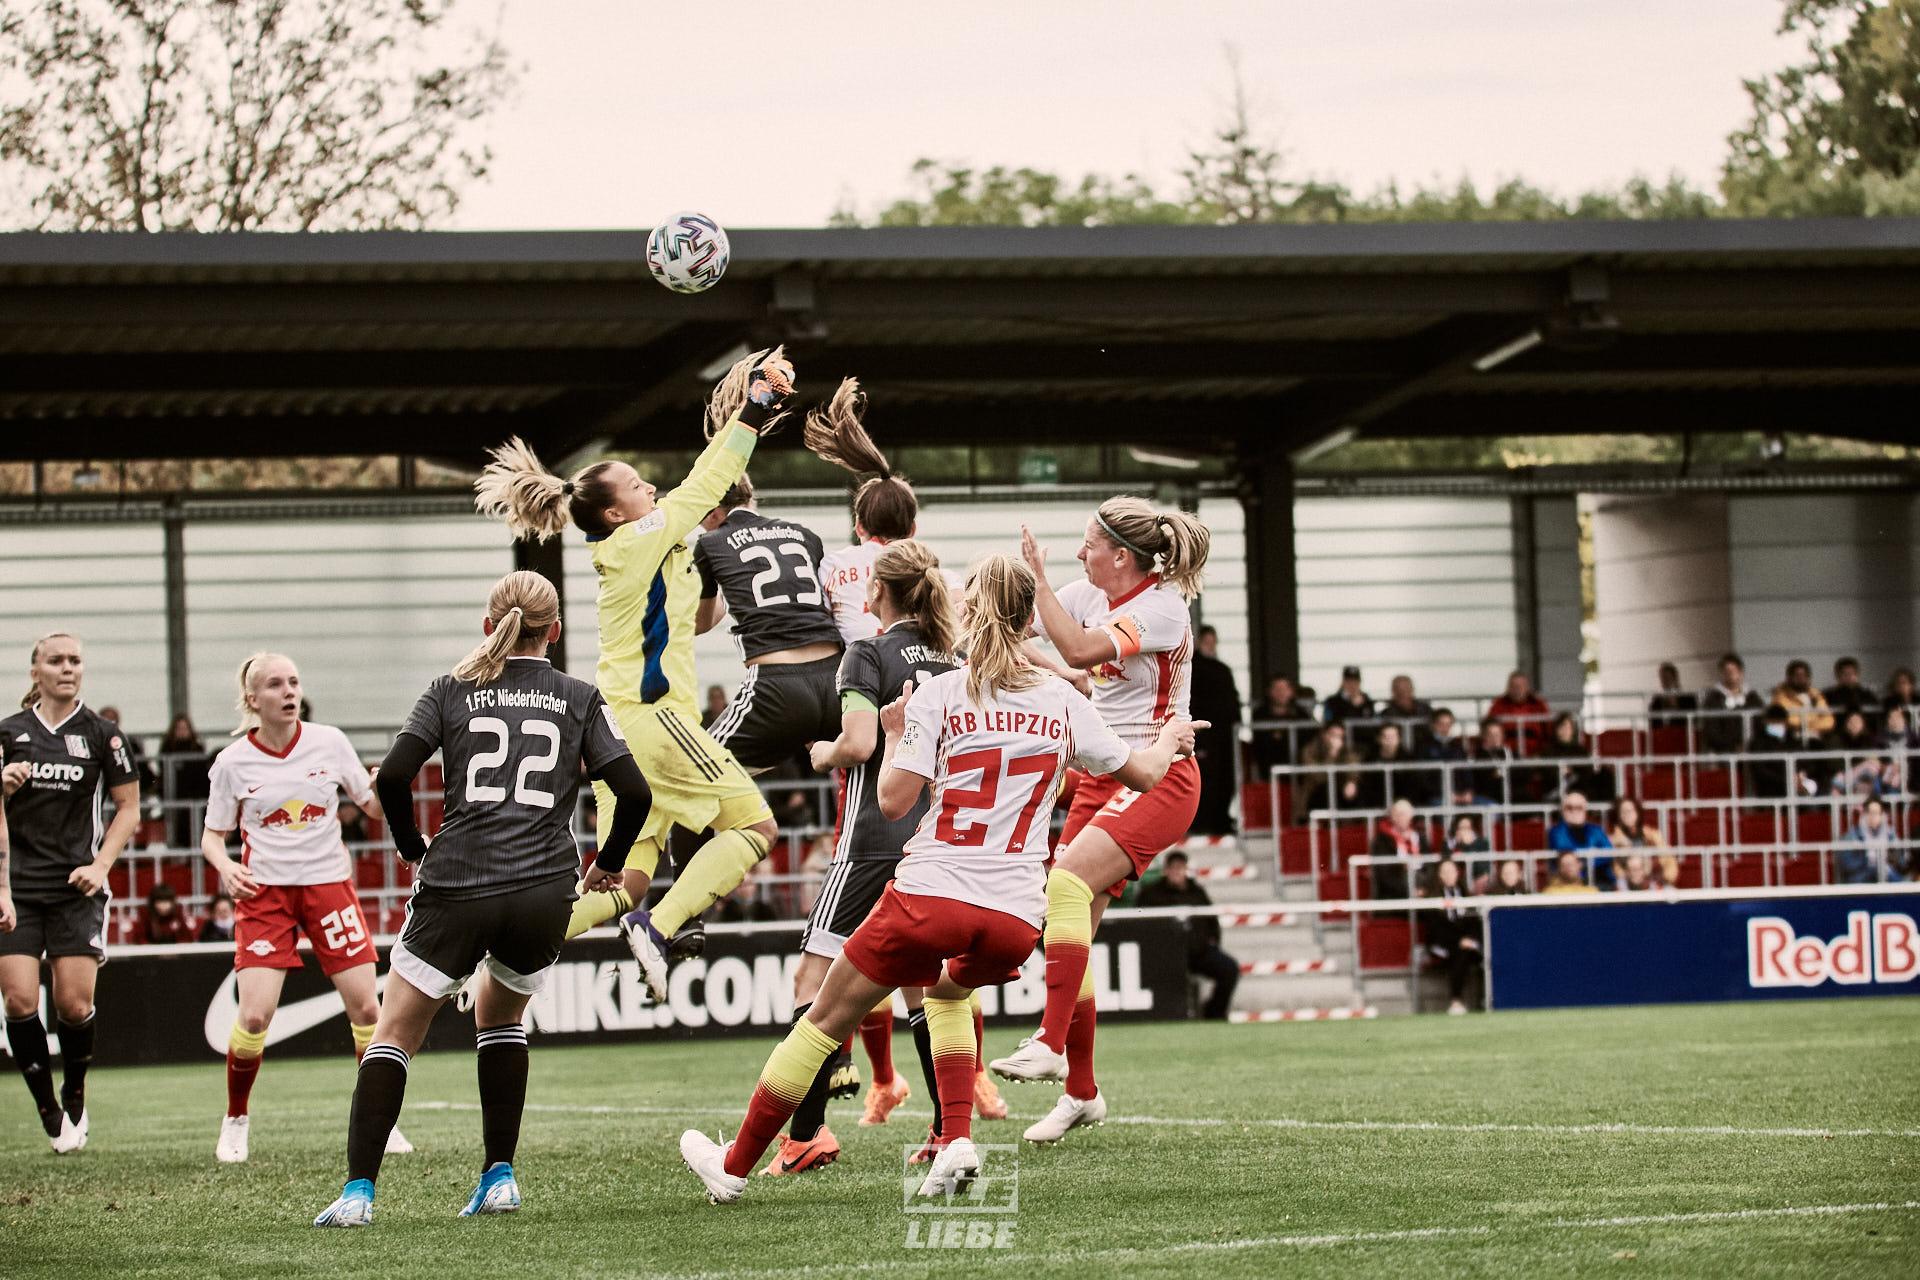 DFB-Pokal: RB Leipzig -vs- 1. FFC Niederkirchen